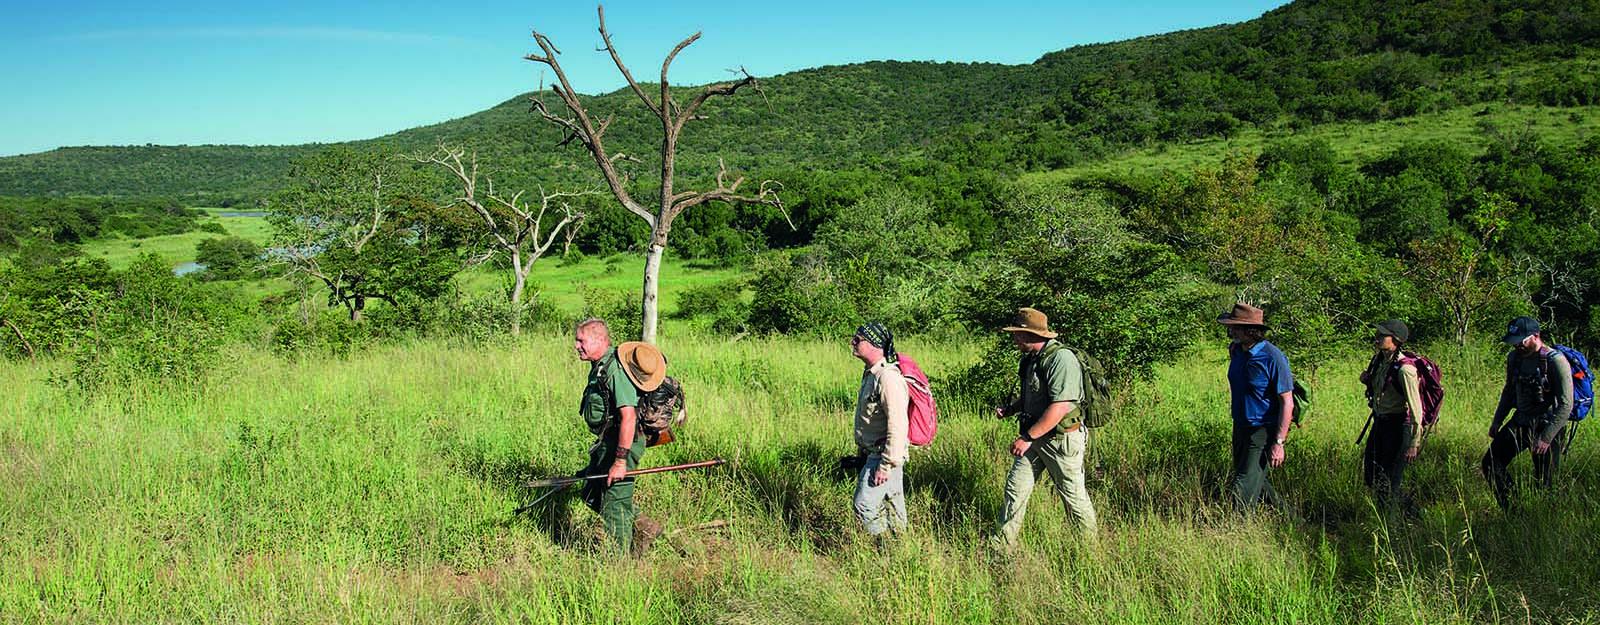 Afrique du Sud : une aventure africaine au Drakensberg